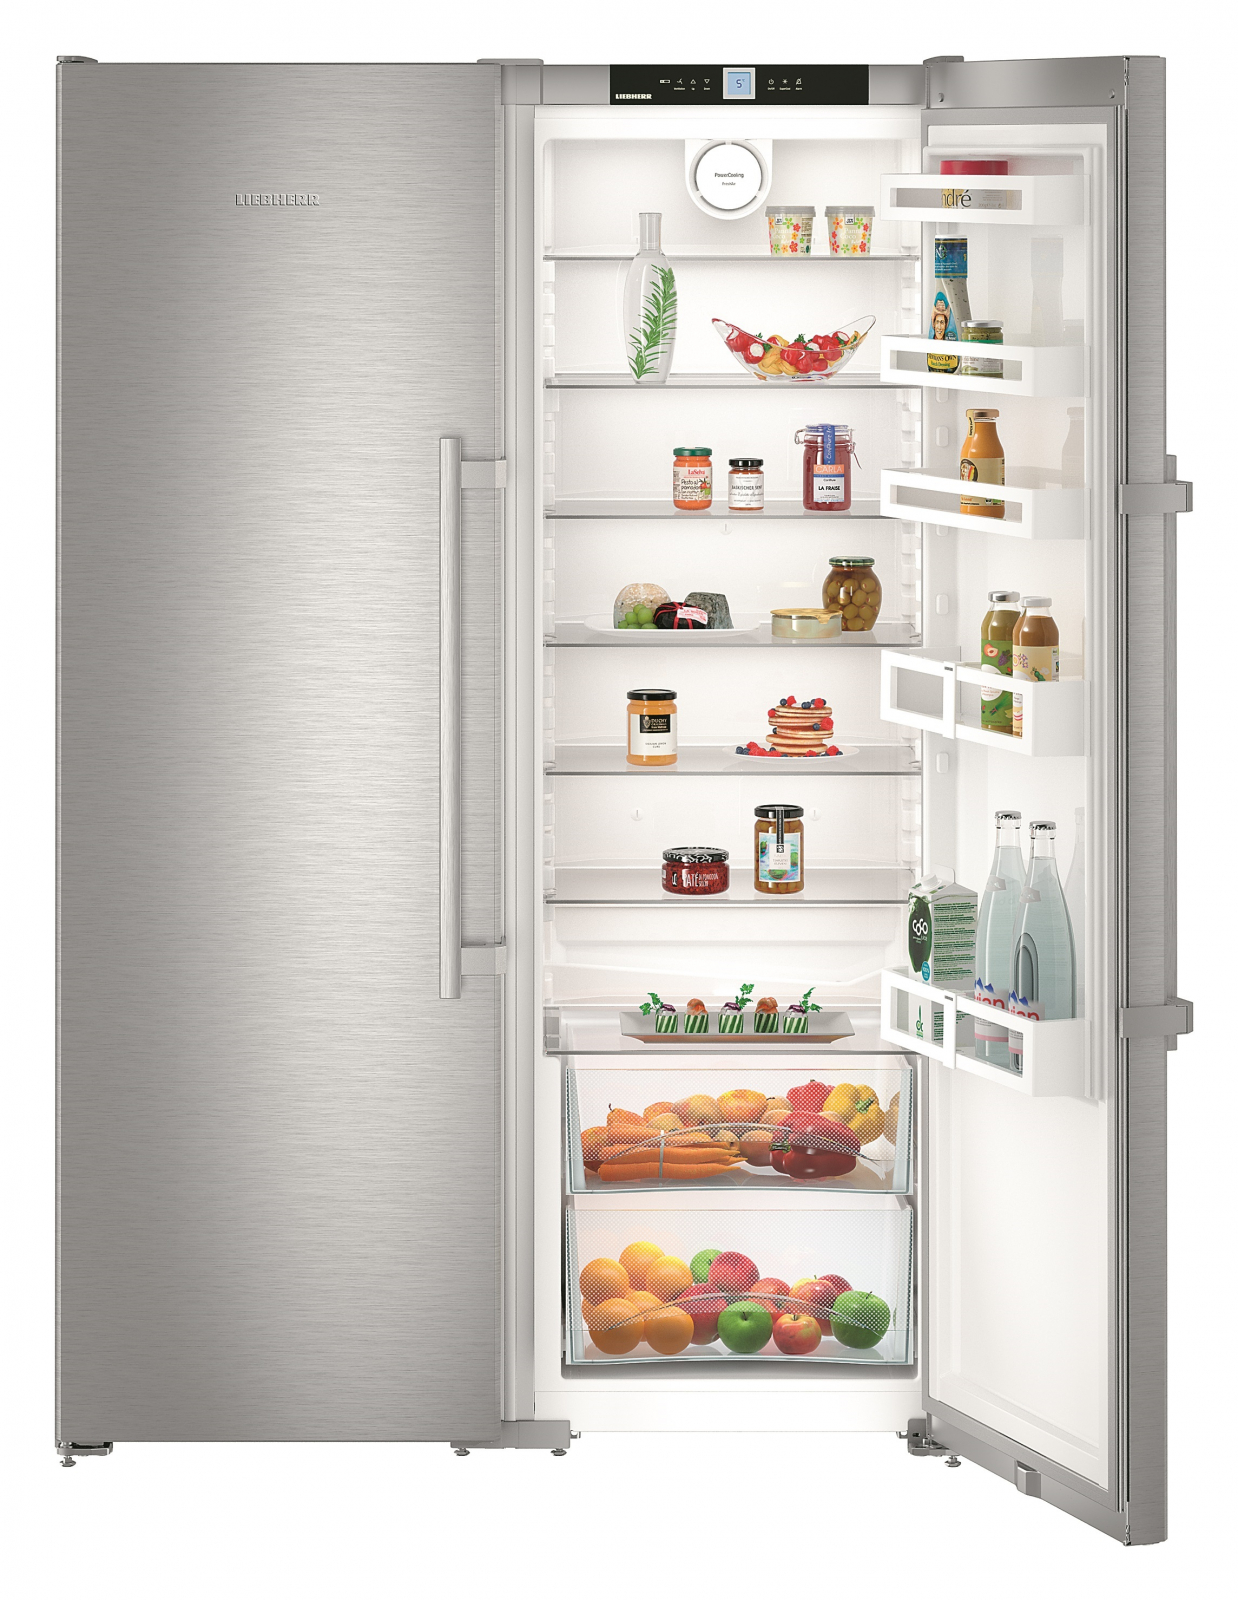 купить Side-by-side холодильник Liebherr SBSef 7242 Украина фото 4